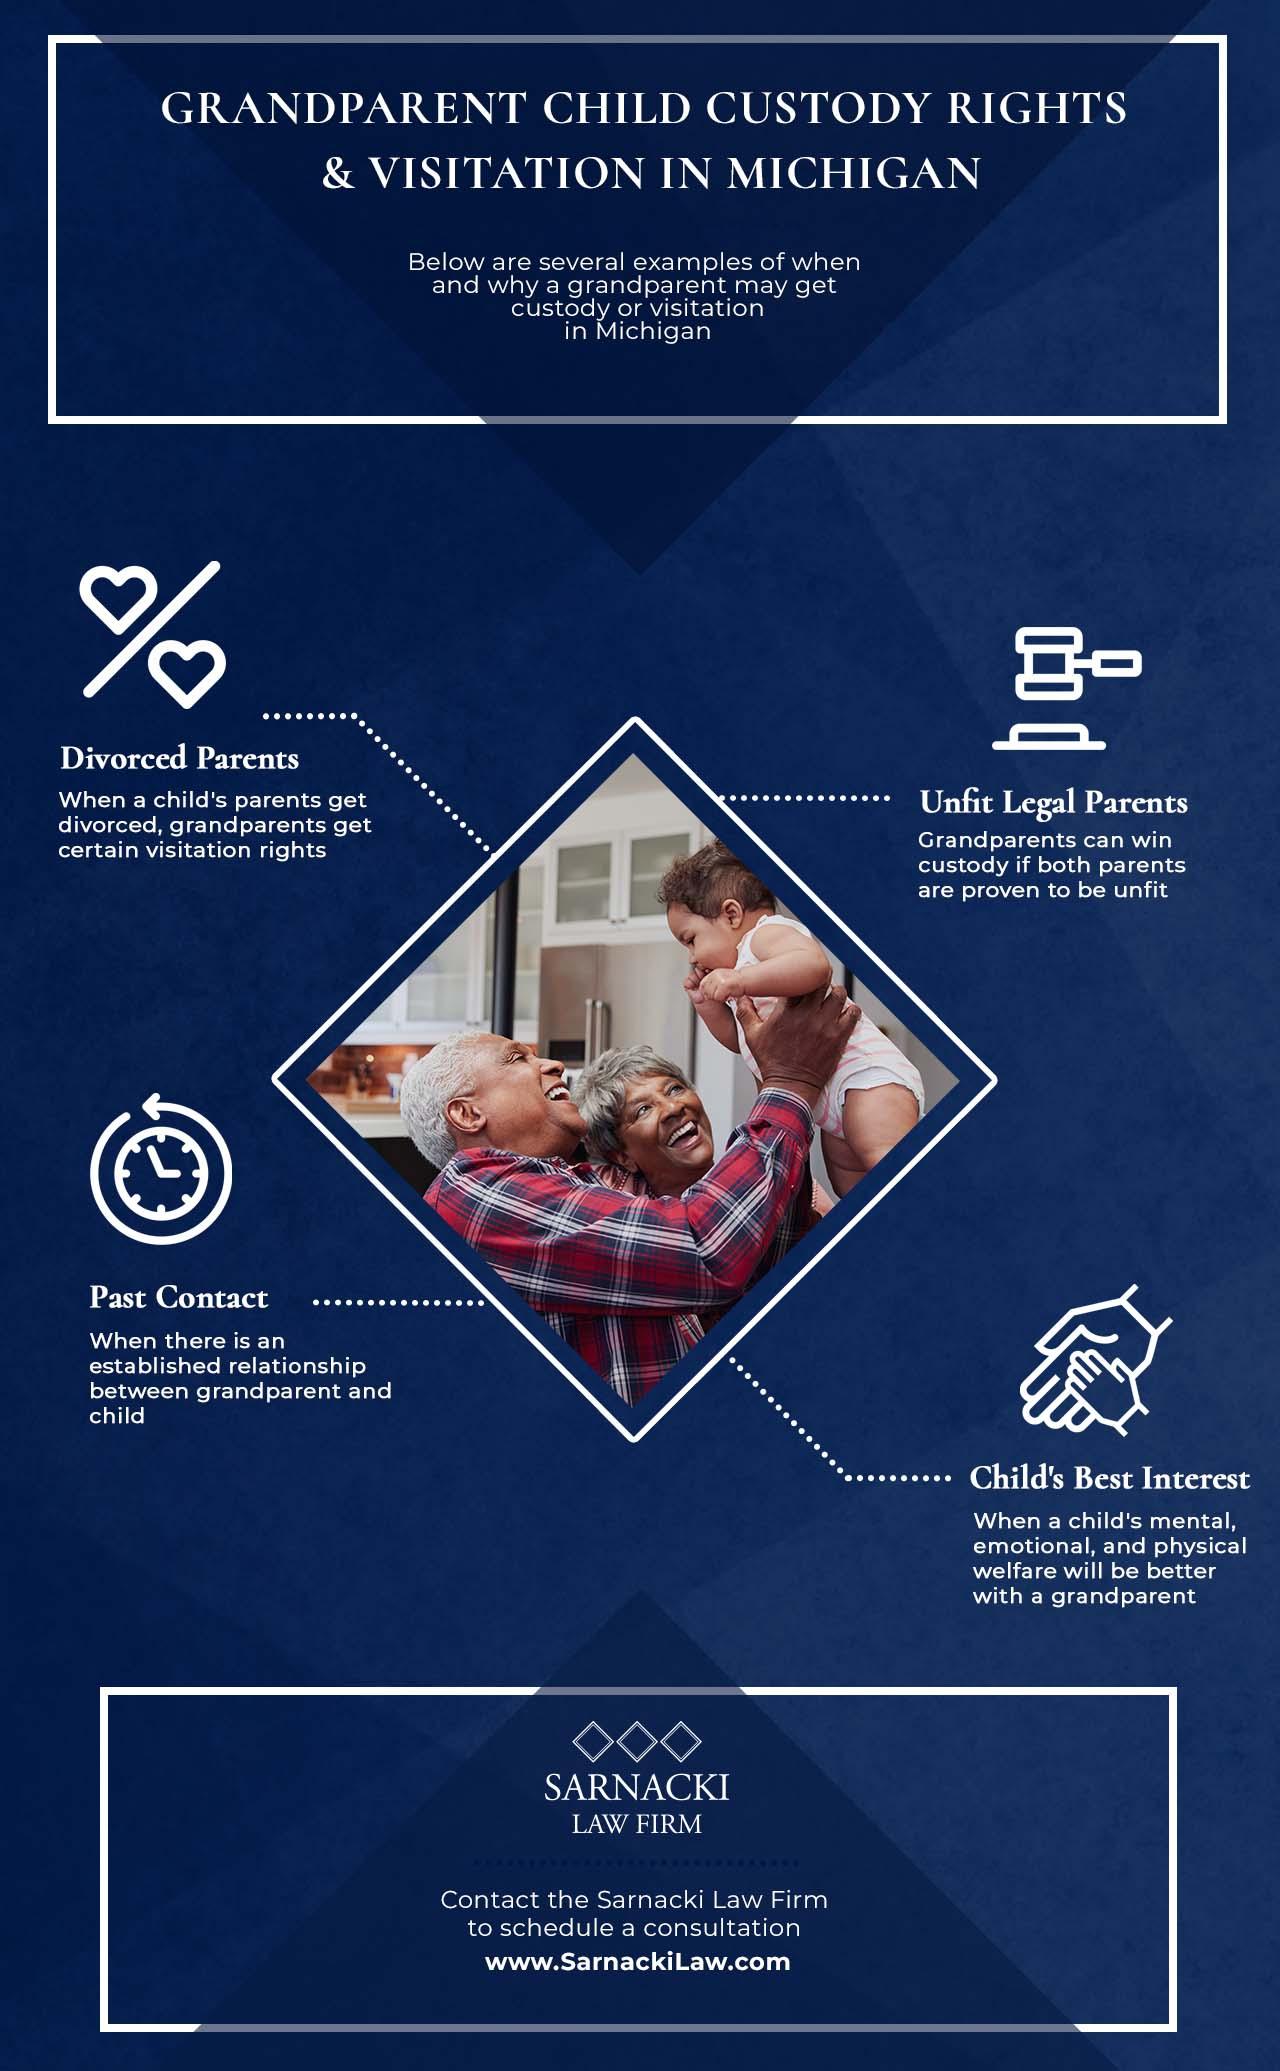 infographic describing grandparent custody rights